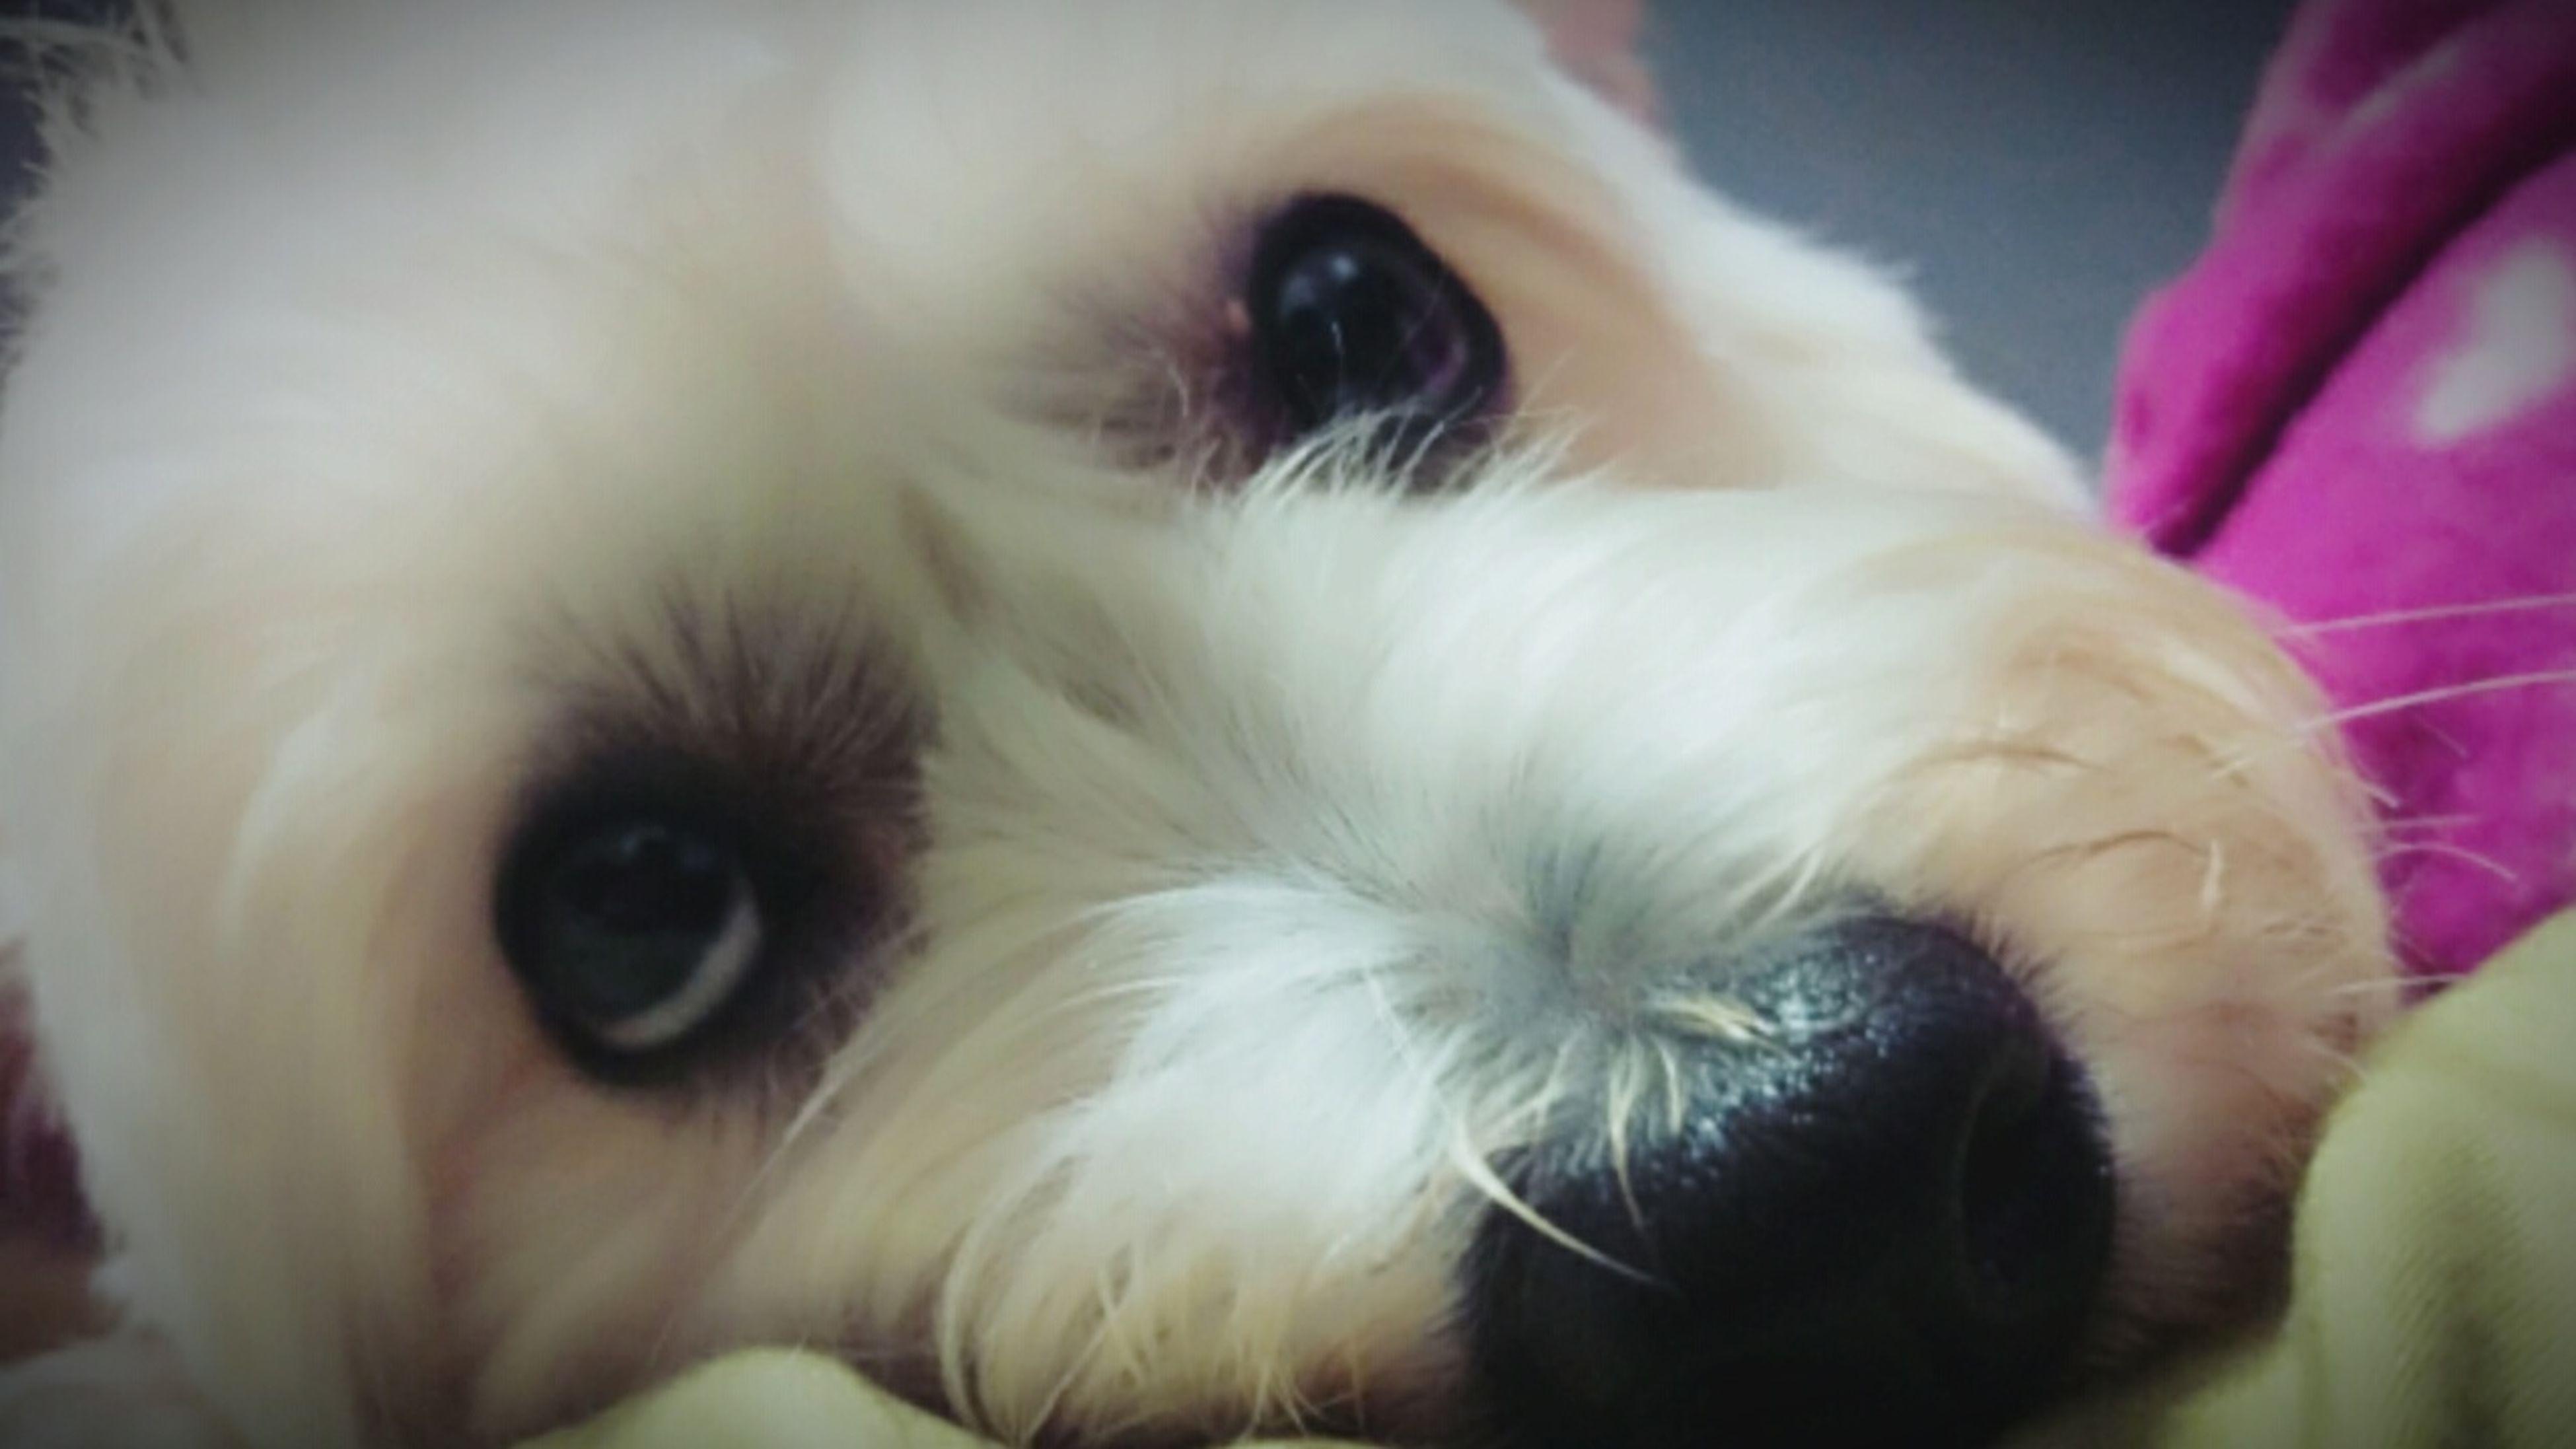 I Love My Dog Family❤ Taking Photos Earthquake 上帝,晚上別再震了喔~~